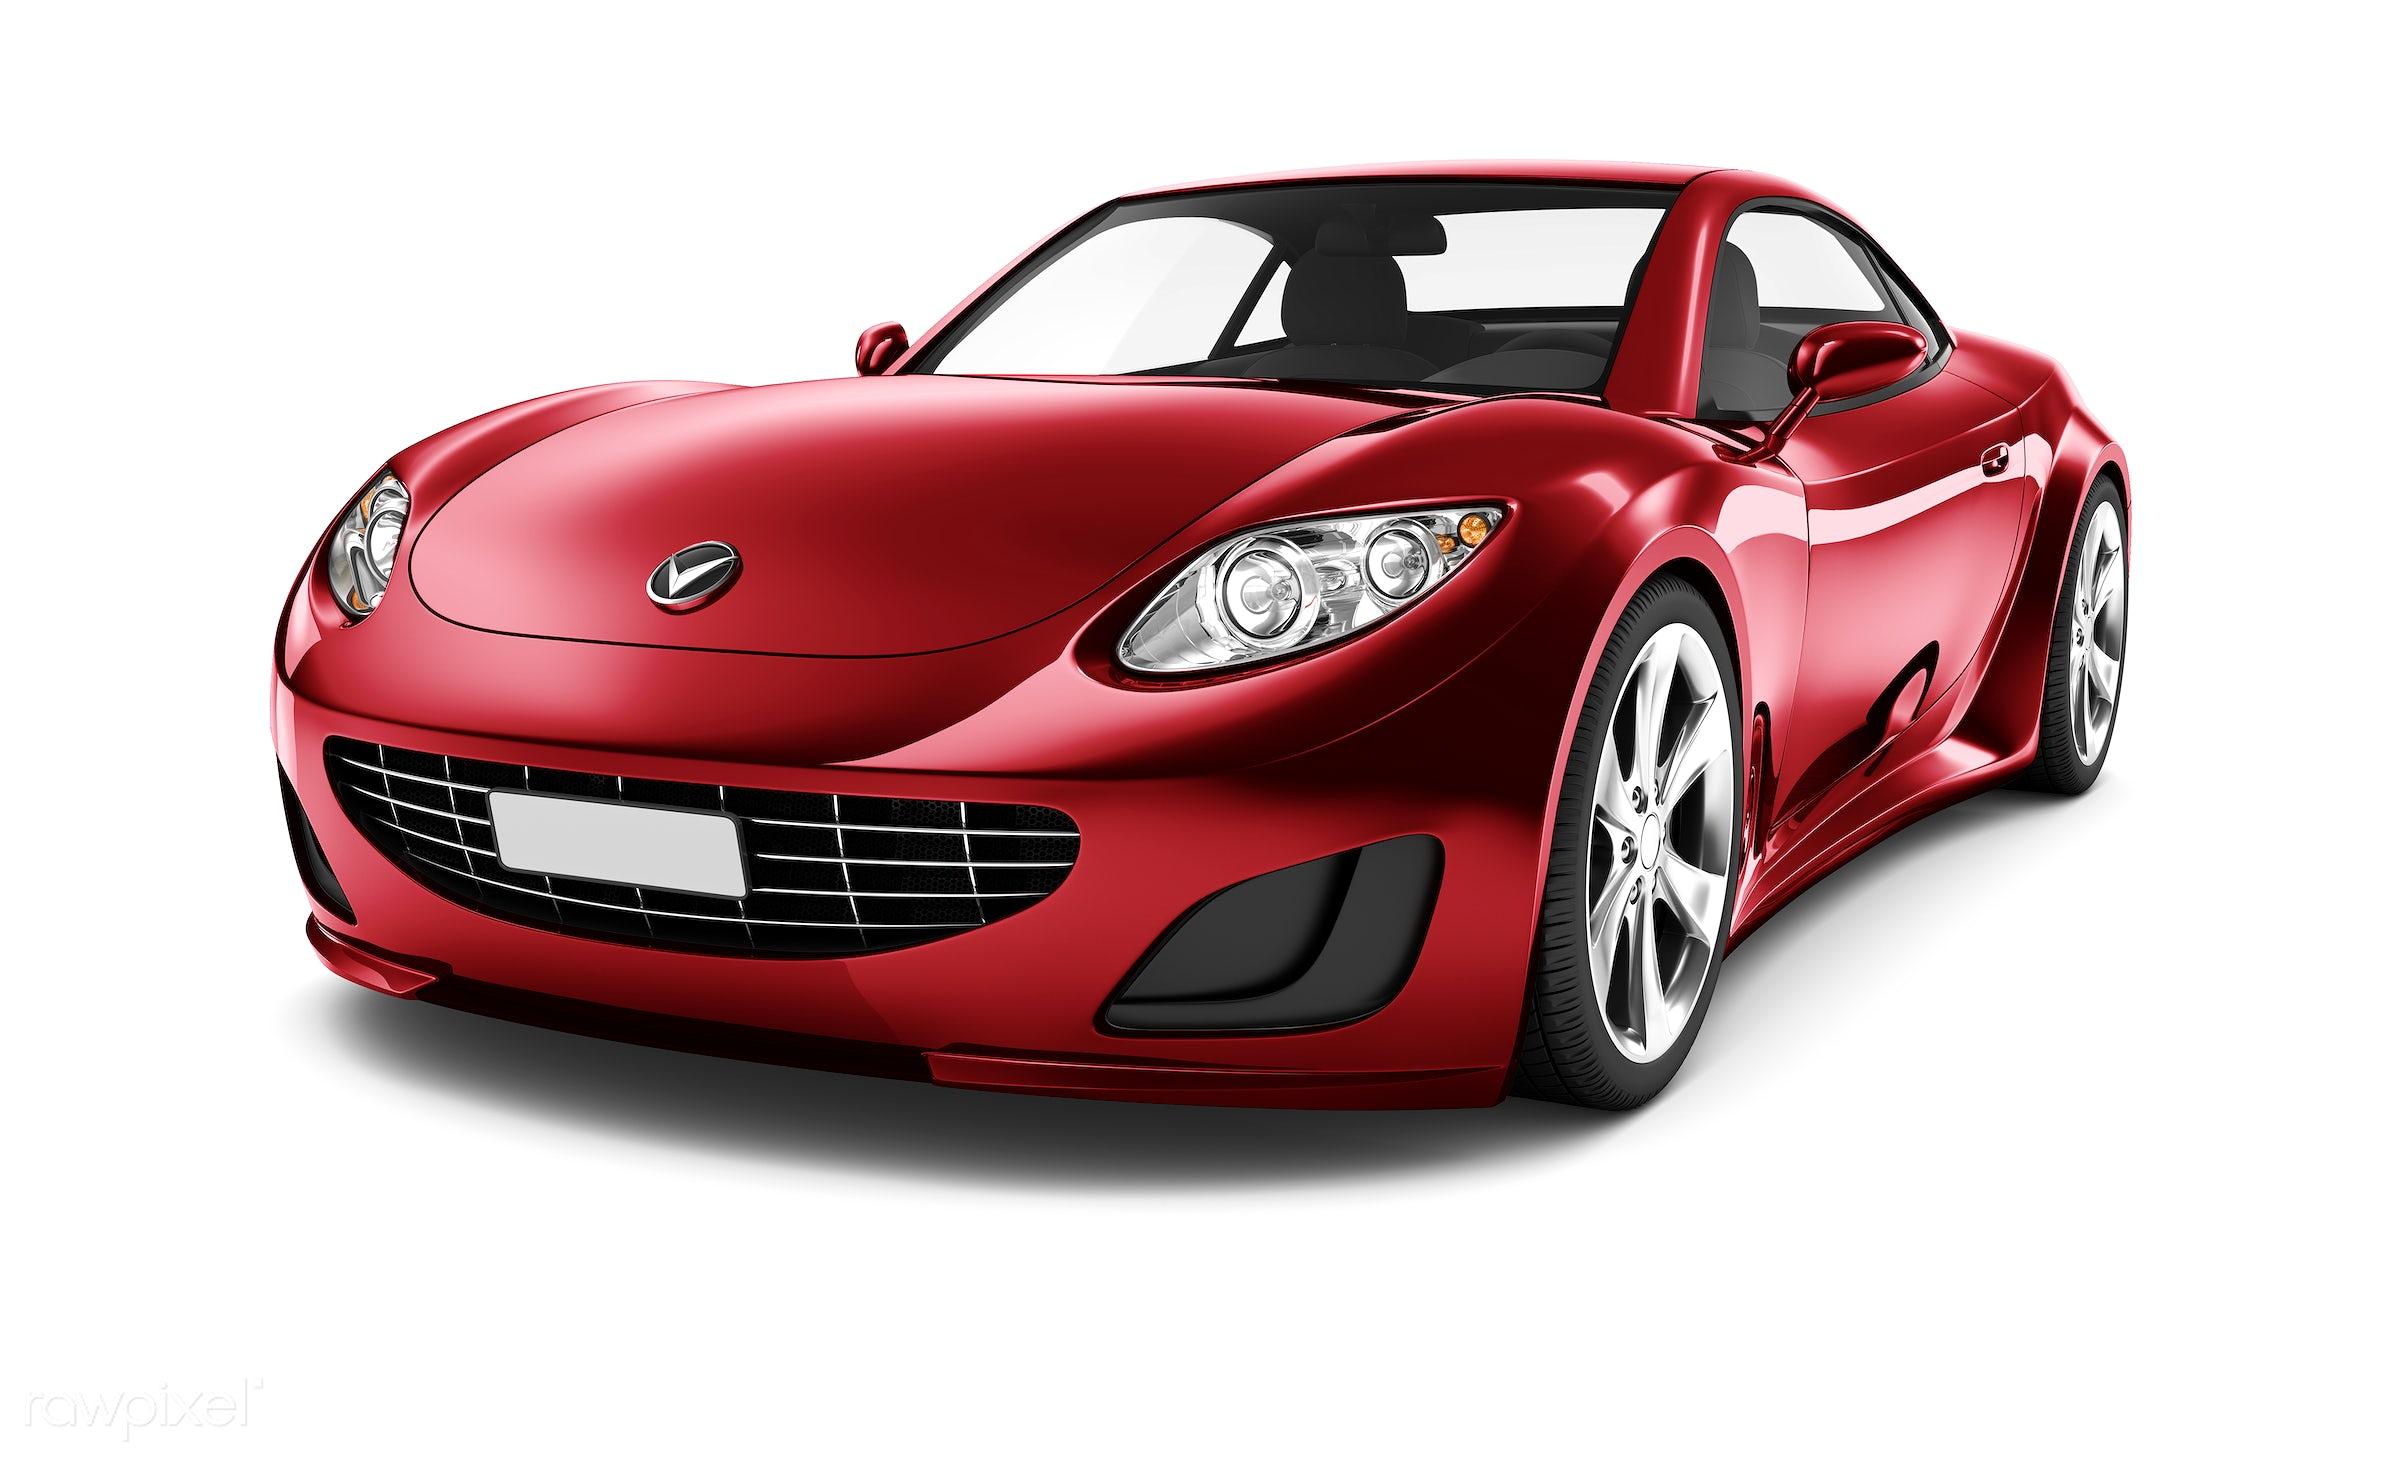 Three dimensional image of car - 3d, automobile, automotive, brandless, car, concept car, elegant, graphic, holiday,...